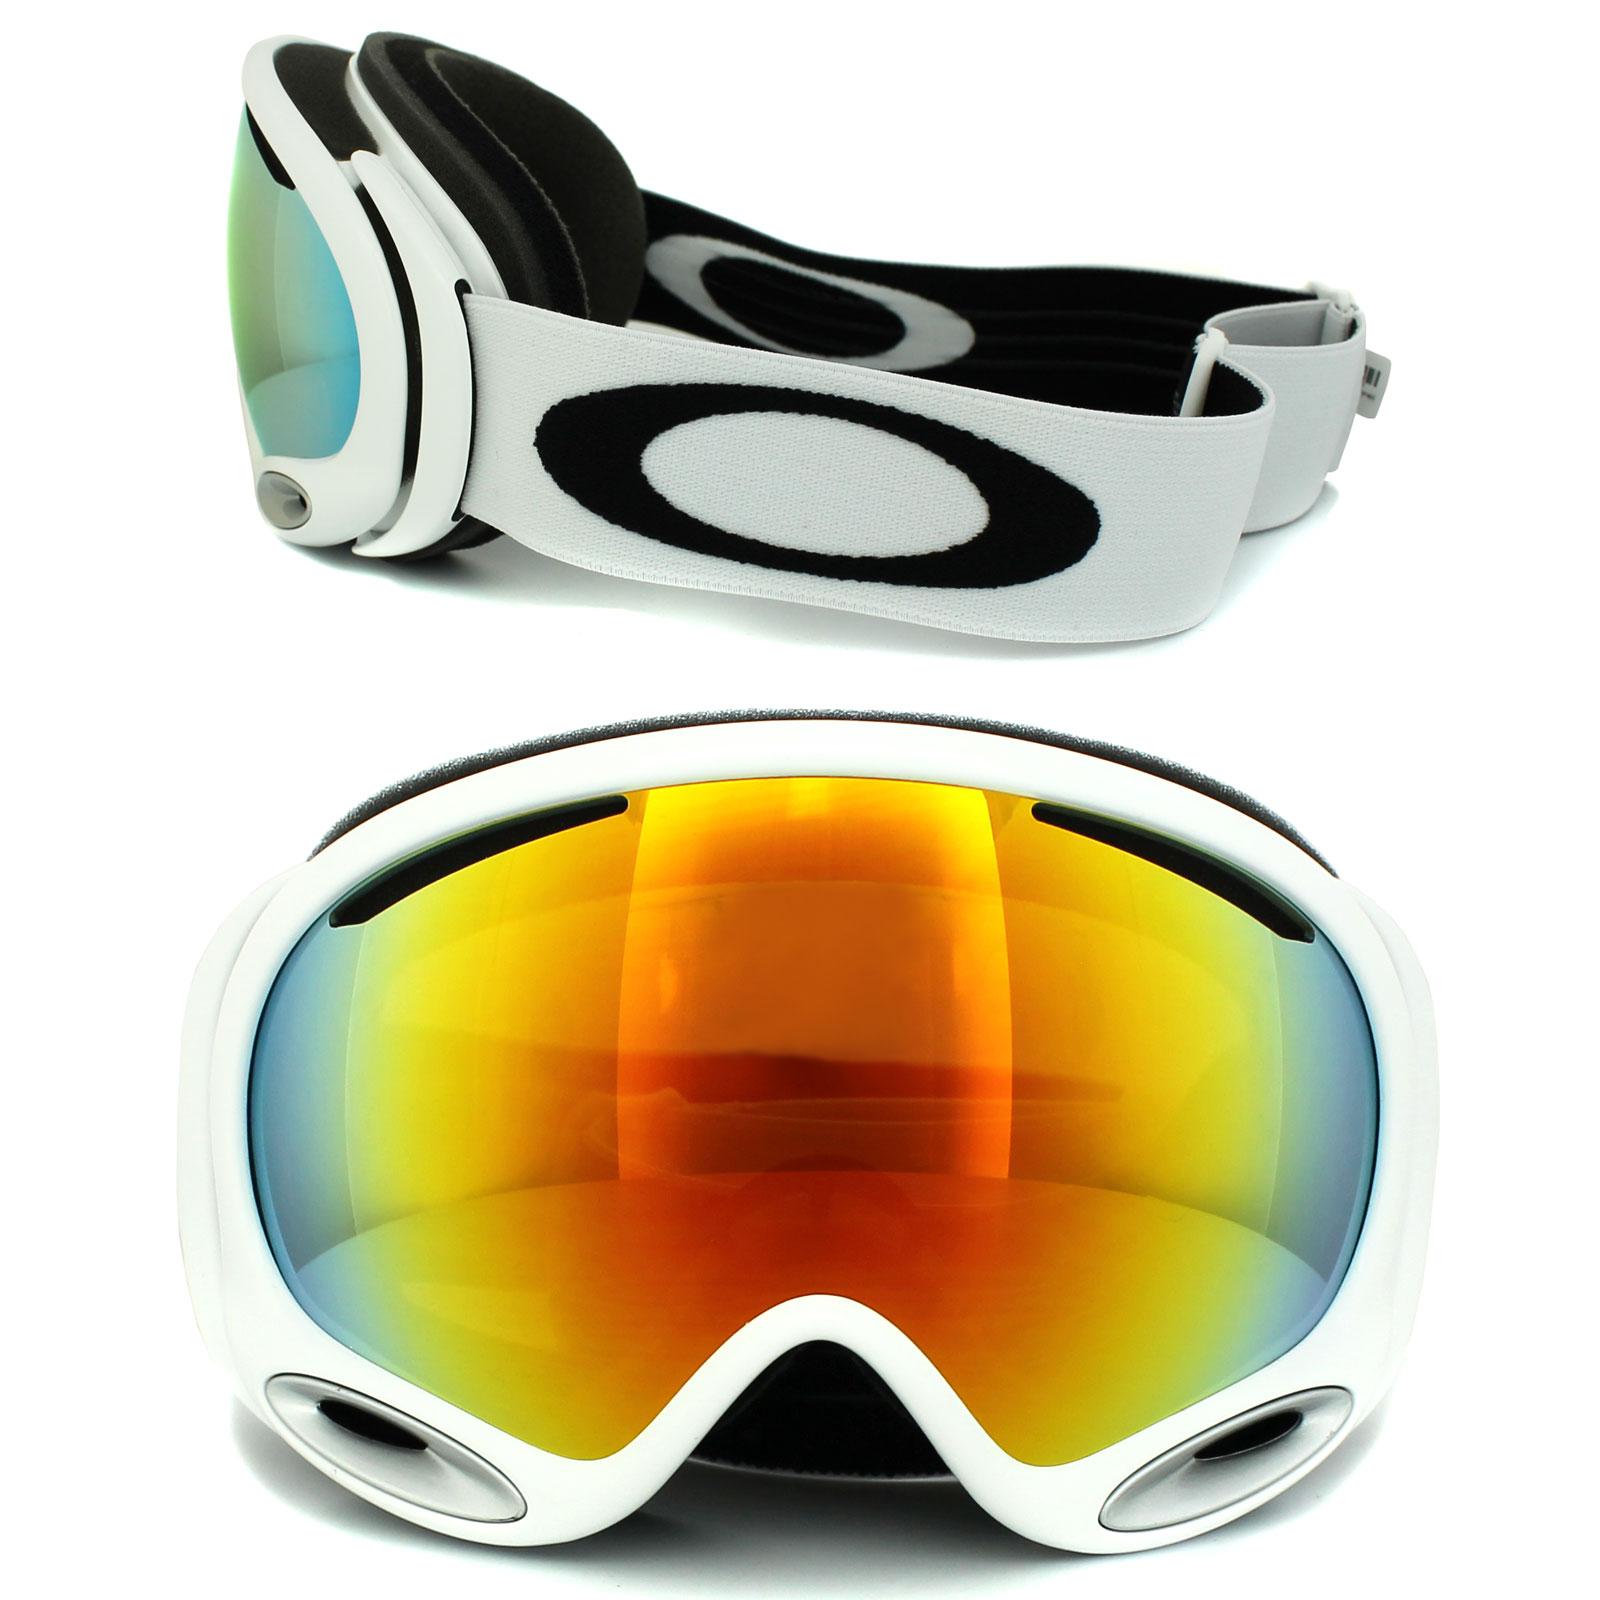 oakley ski goggles a frame  Oakley Ski Goggles A Frame 2.0 59-568 Polished White Fire Iridium ...